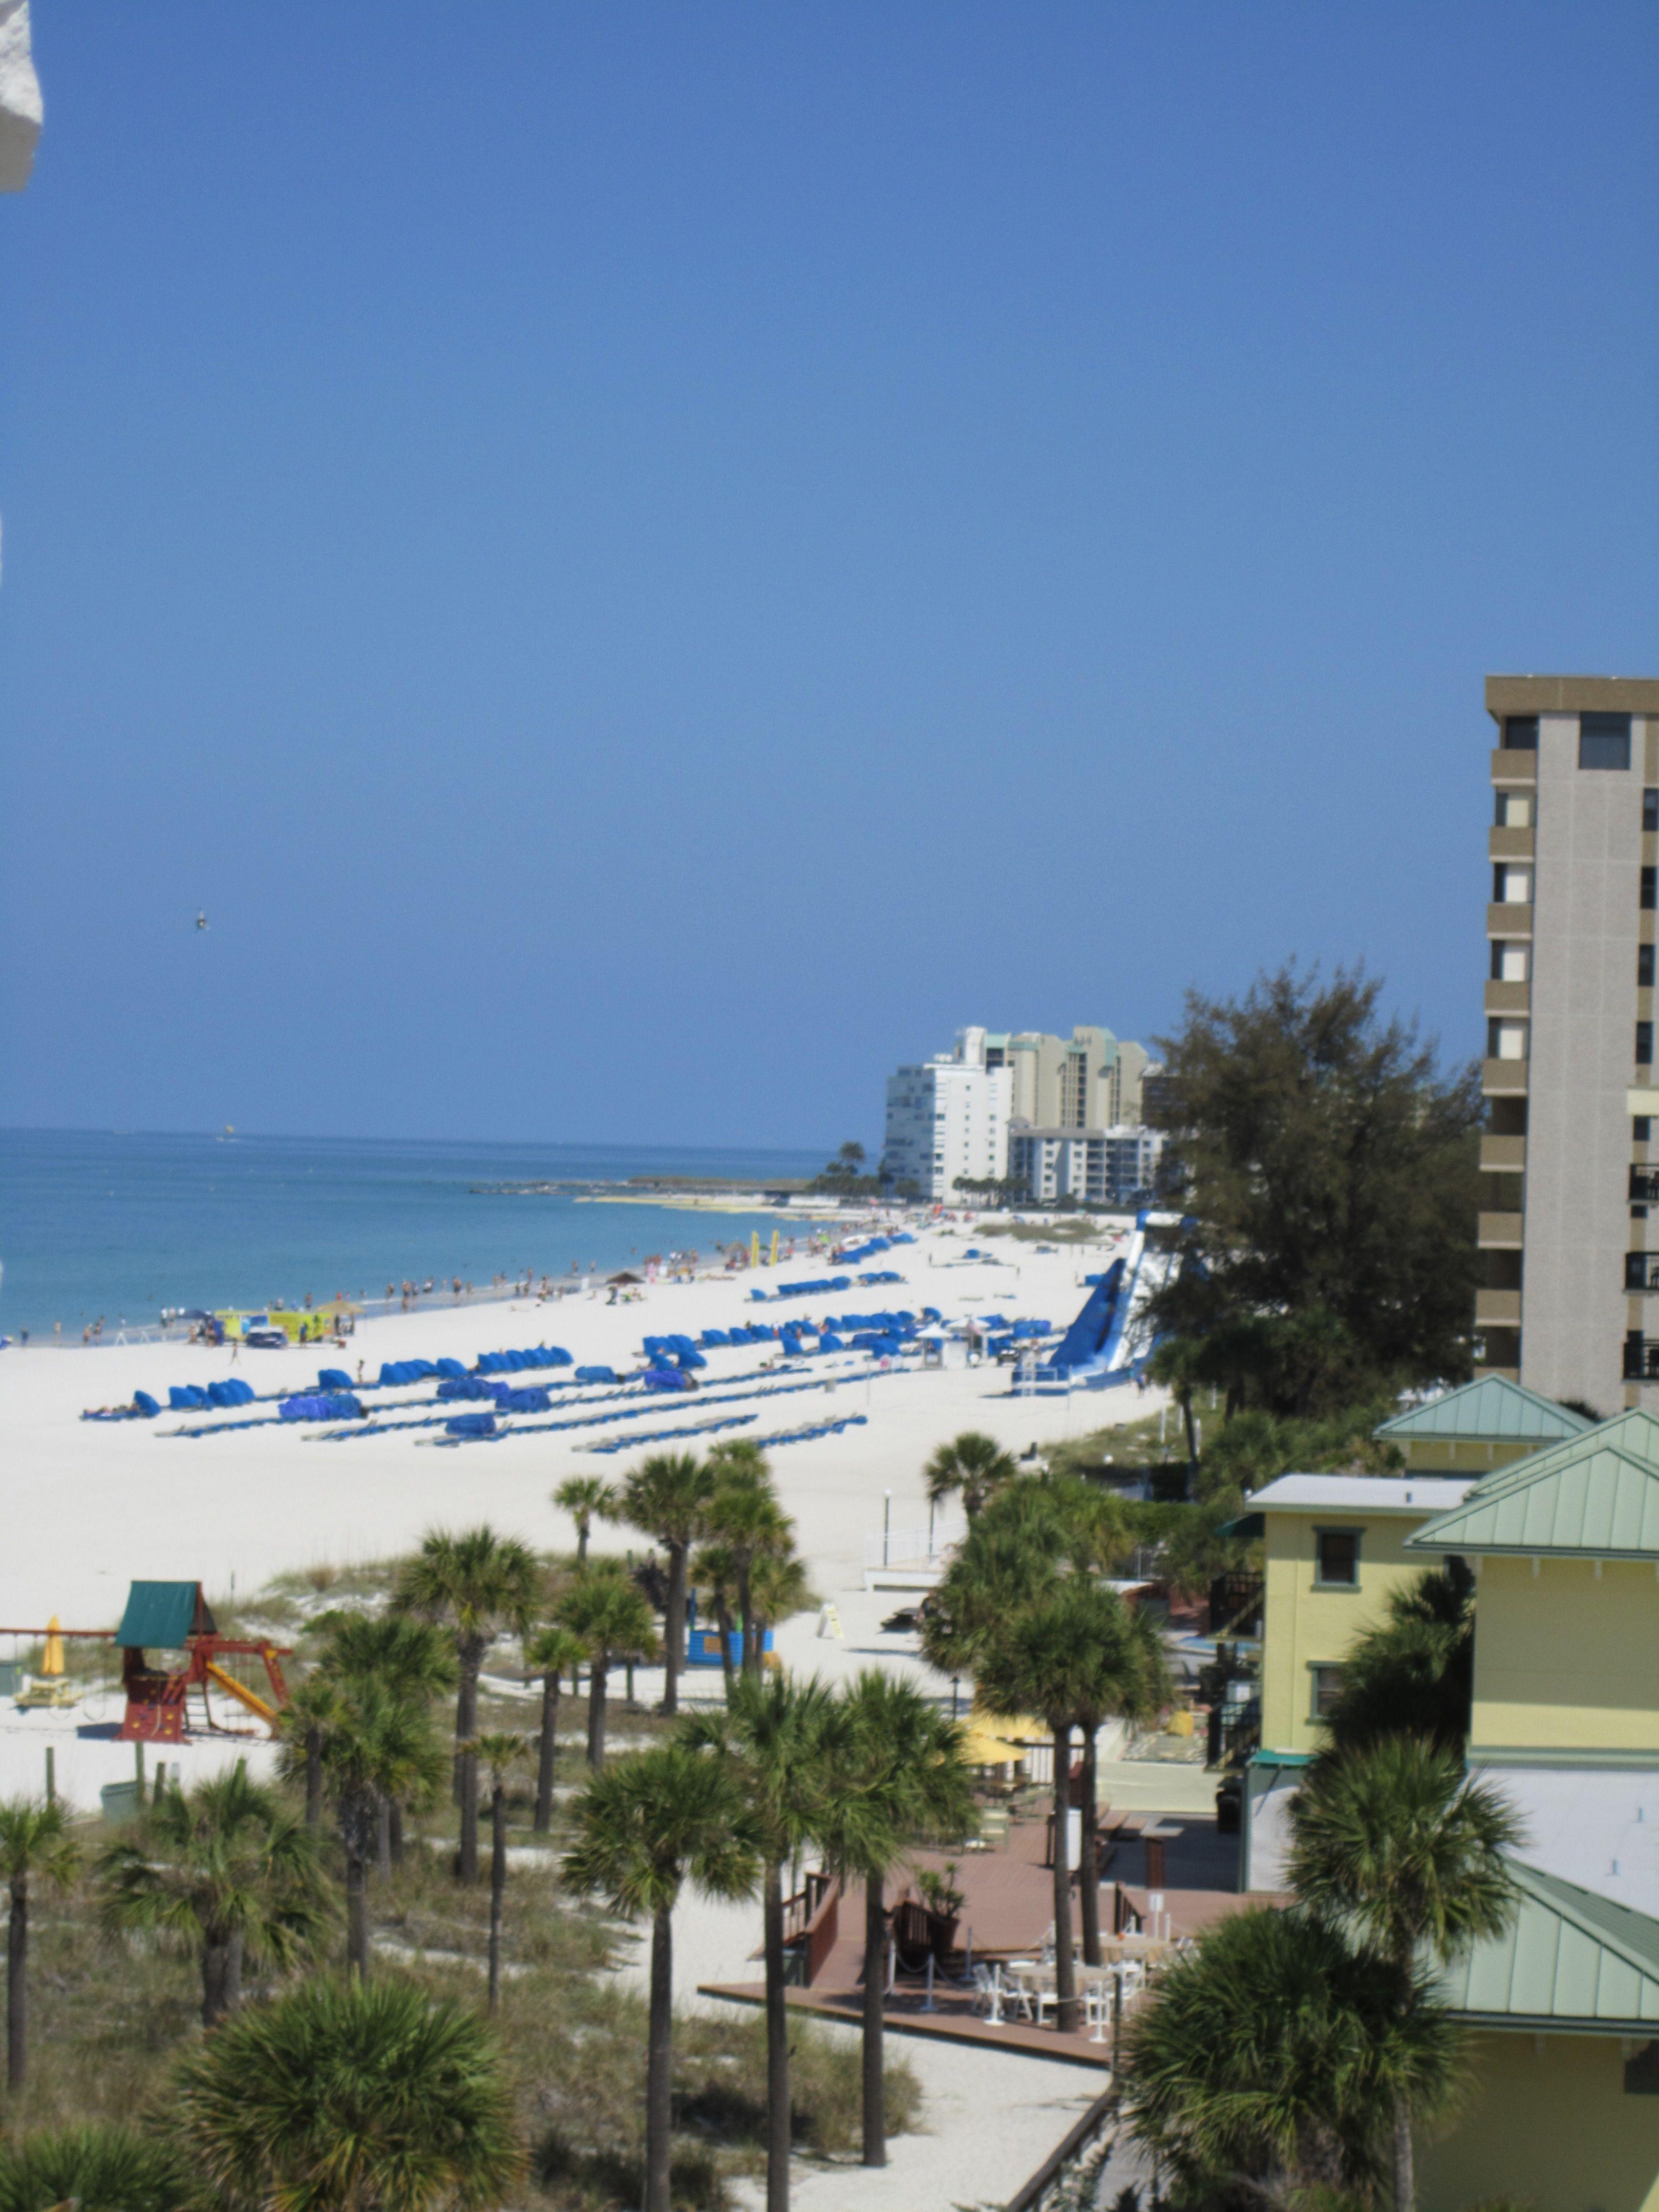 At The Grand Plaza Hotel, St. Pete Beach, Florida. Balcony